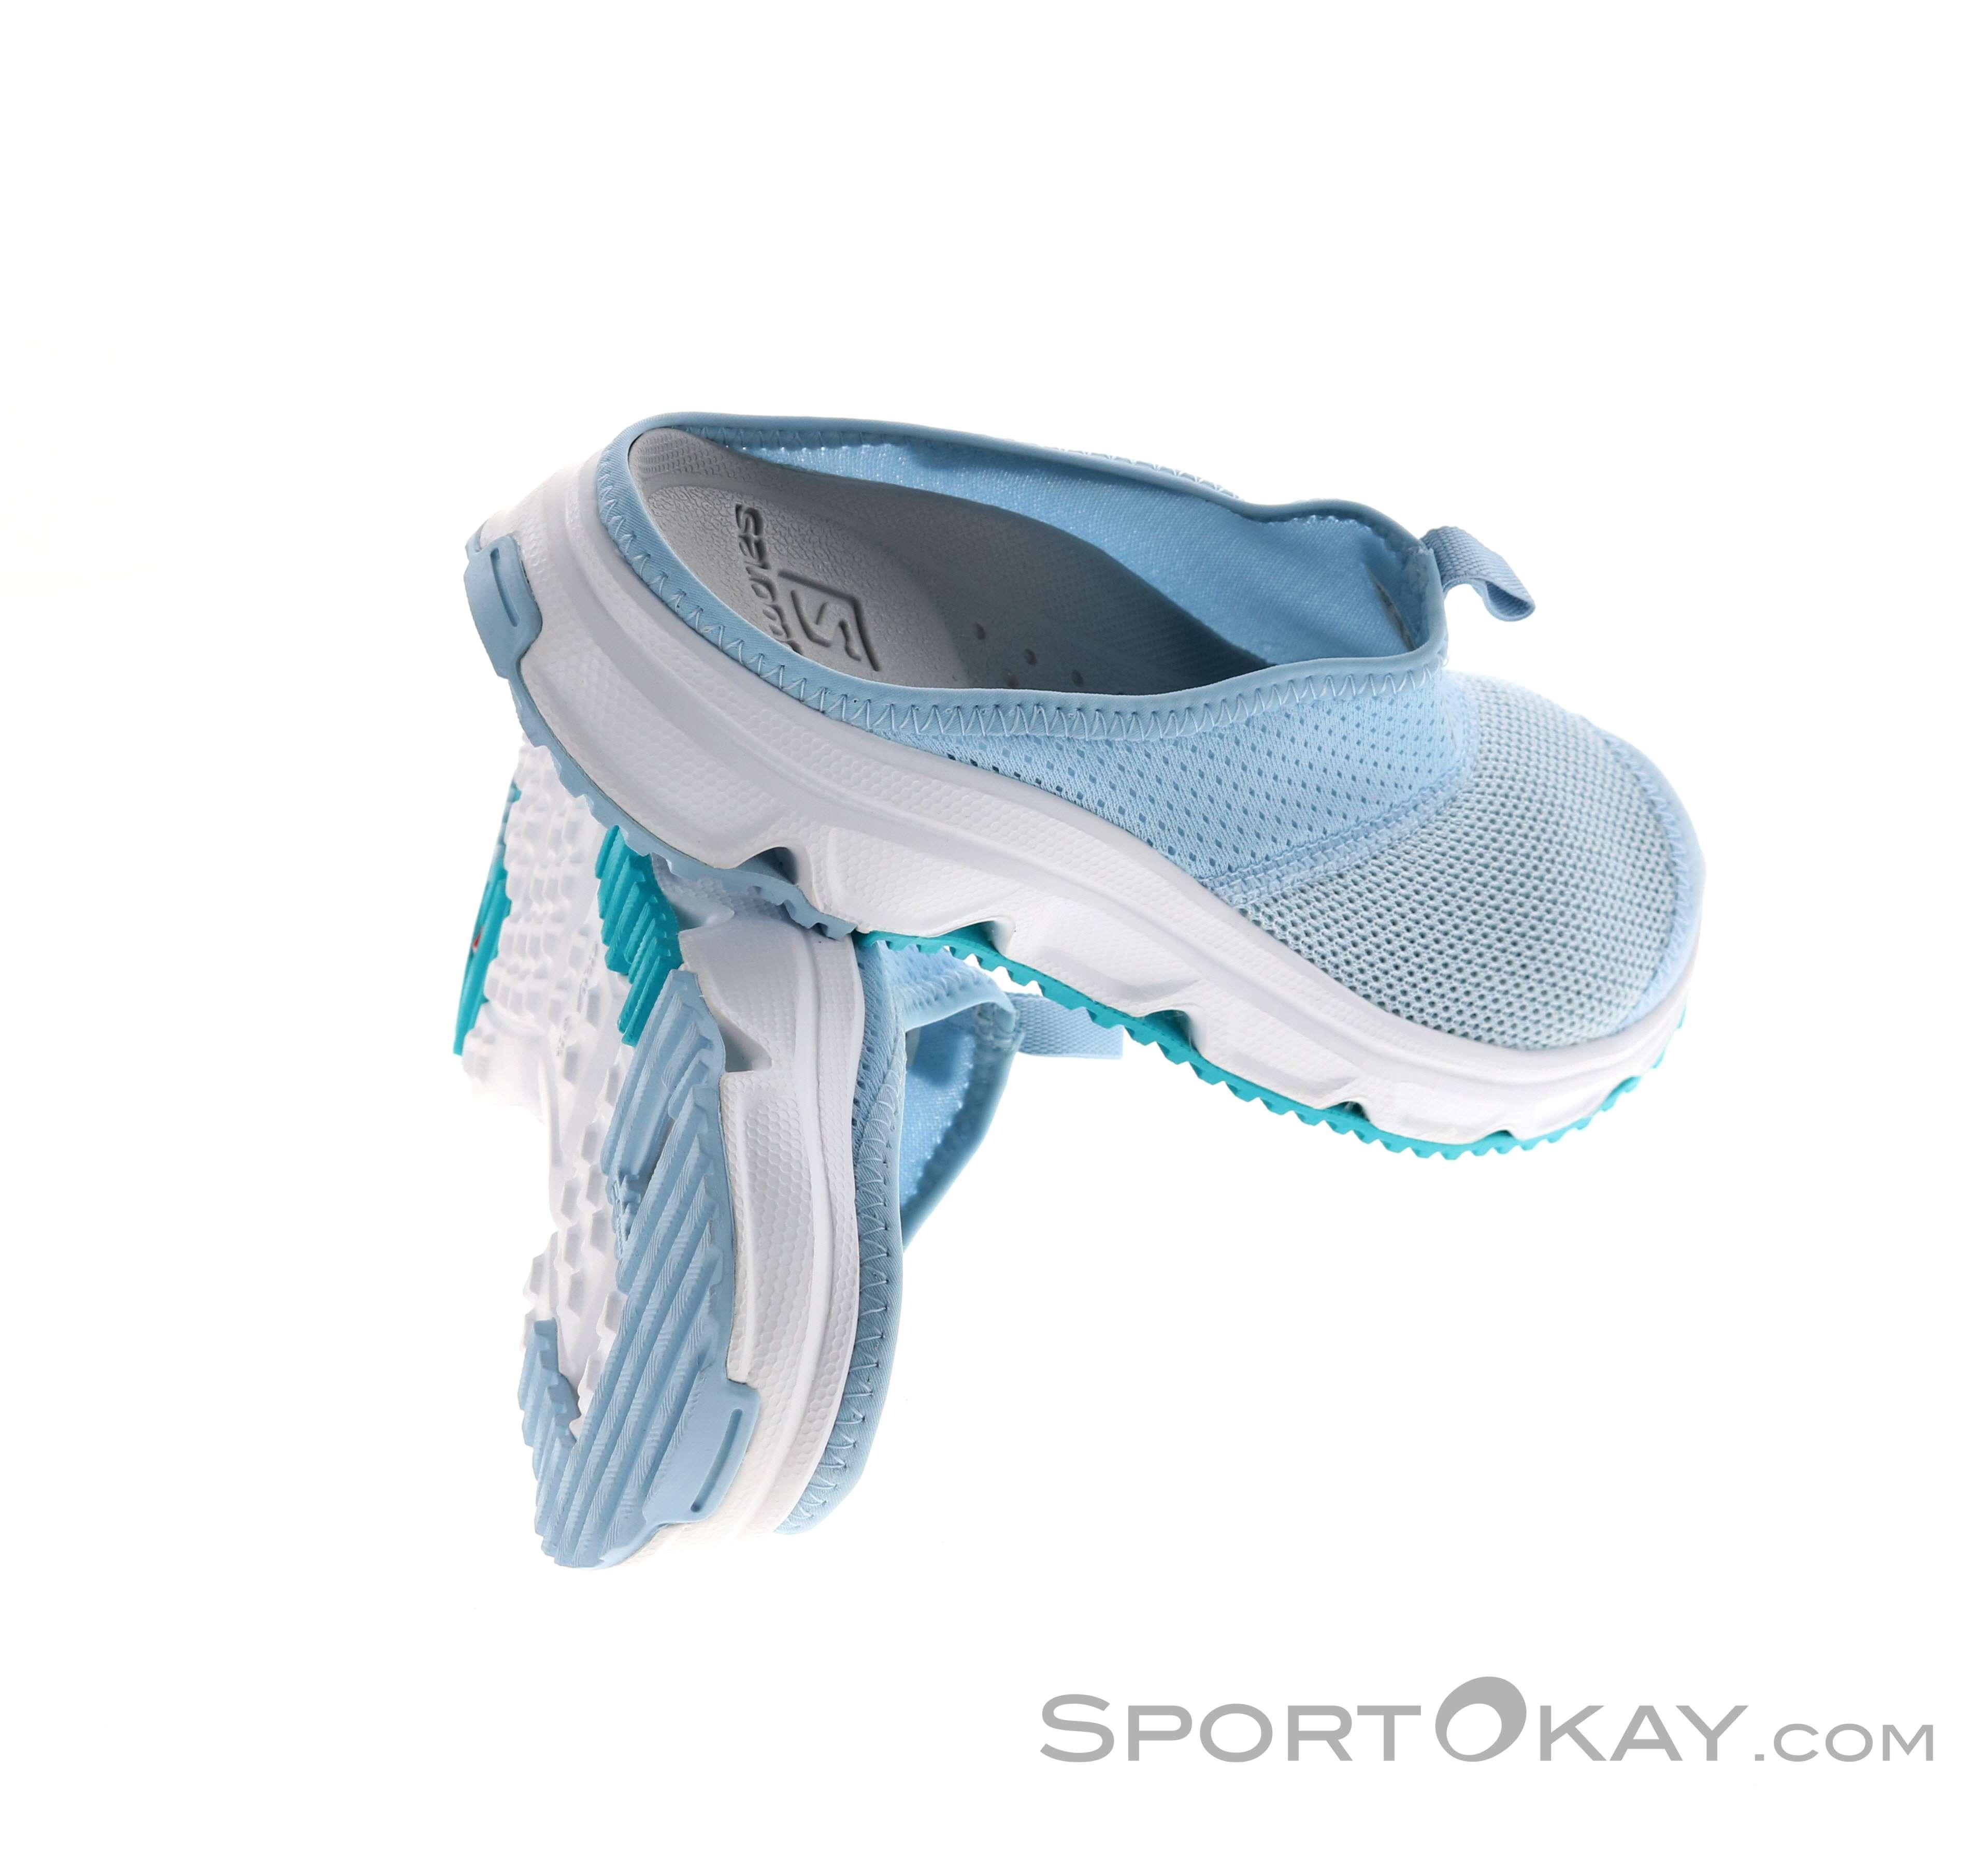 Salomon Salomon RX Slide 4.0 Womens Leisure Shoes